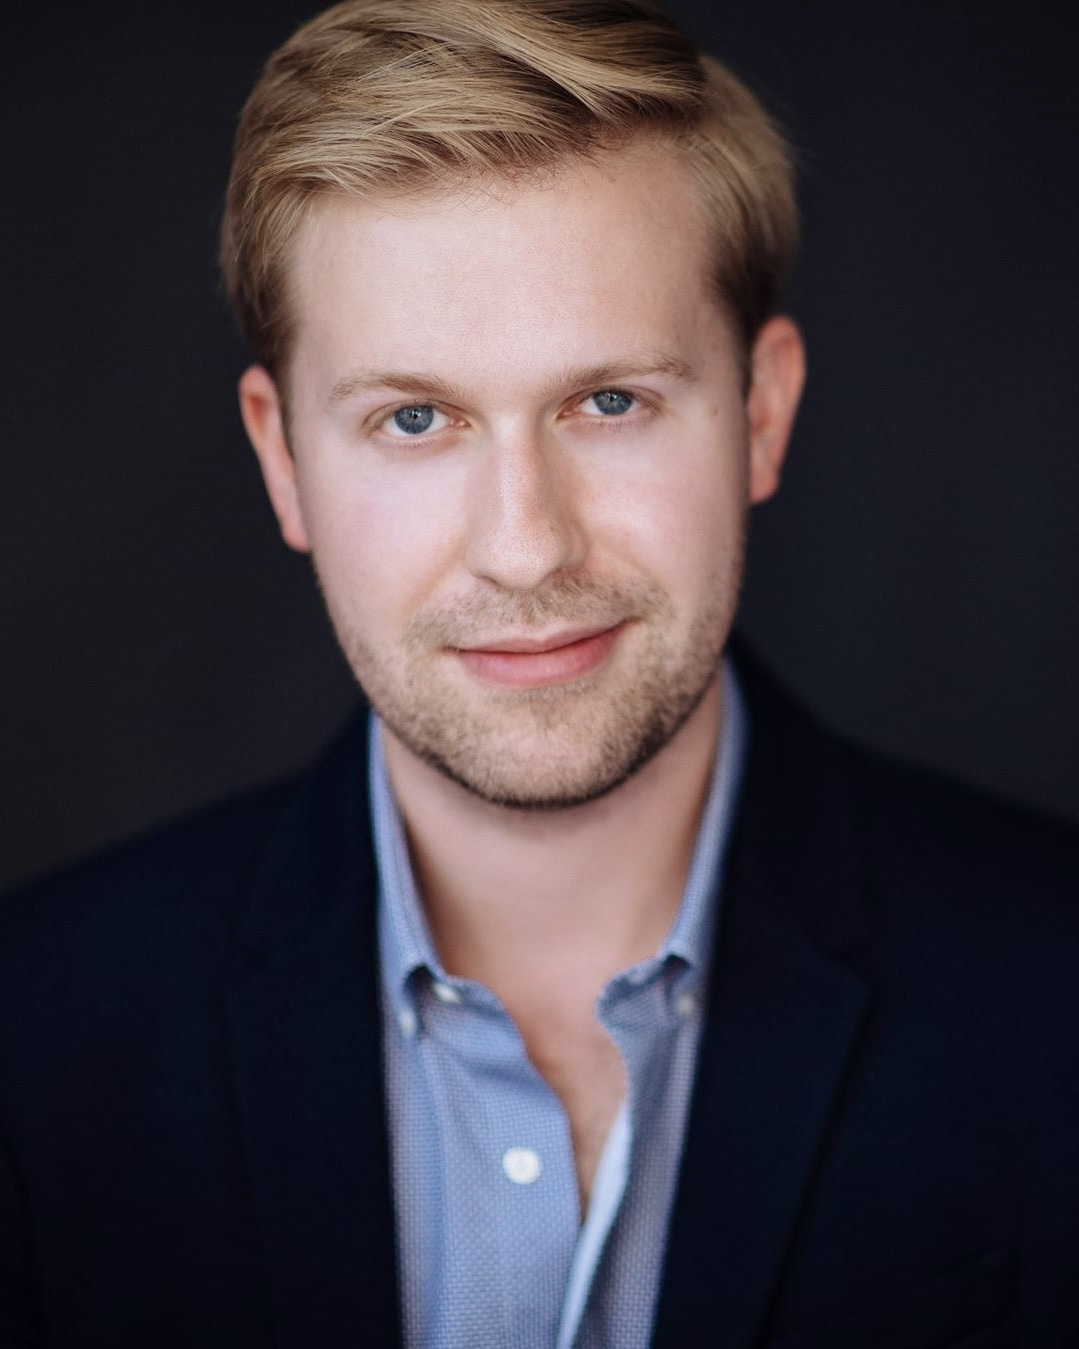 Steven Seigart